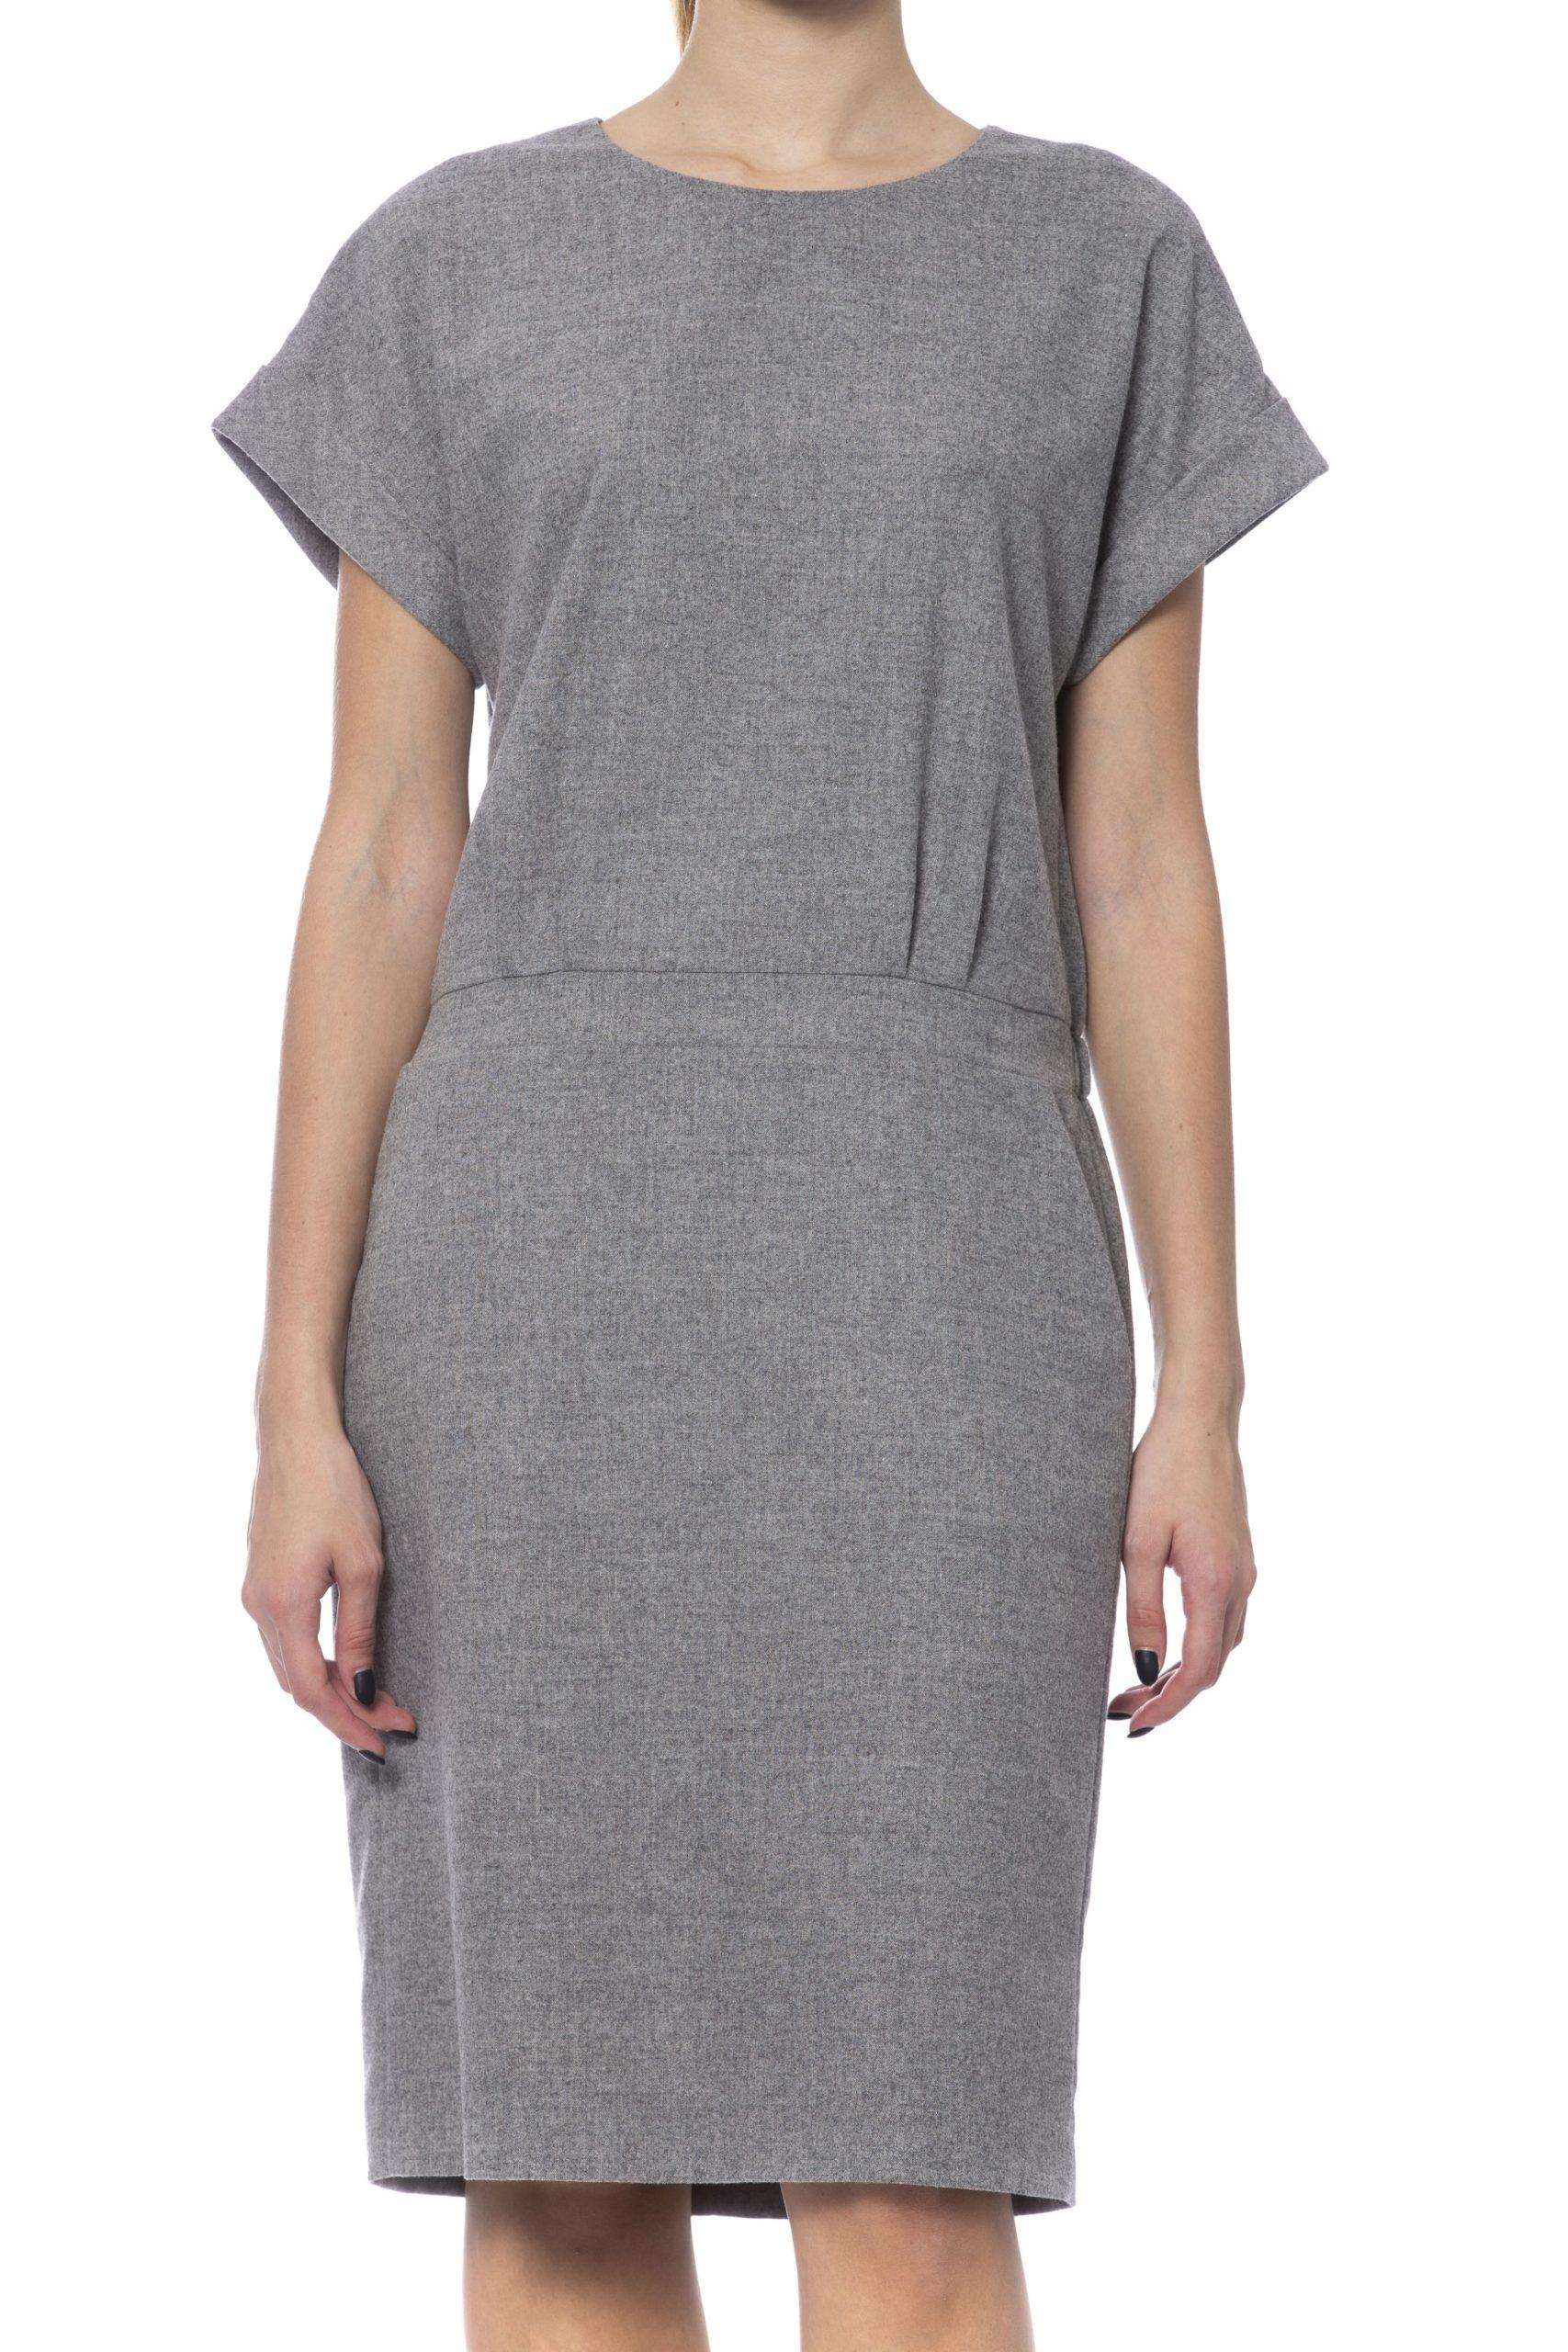 Peserico Women's Dress Grey PE993272 - IT42 | S